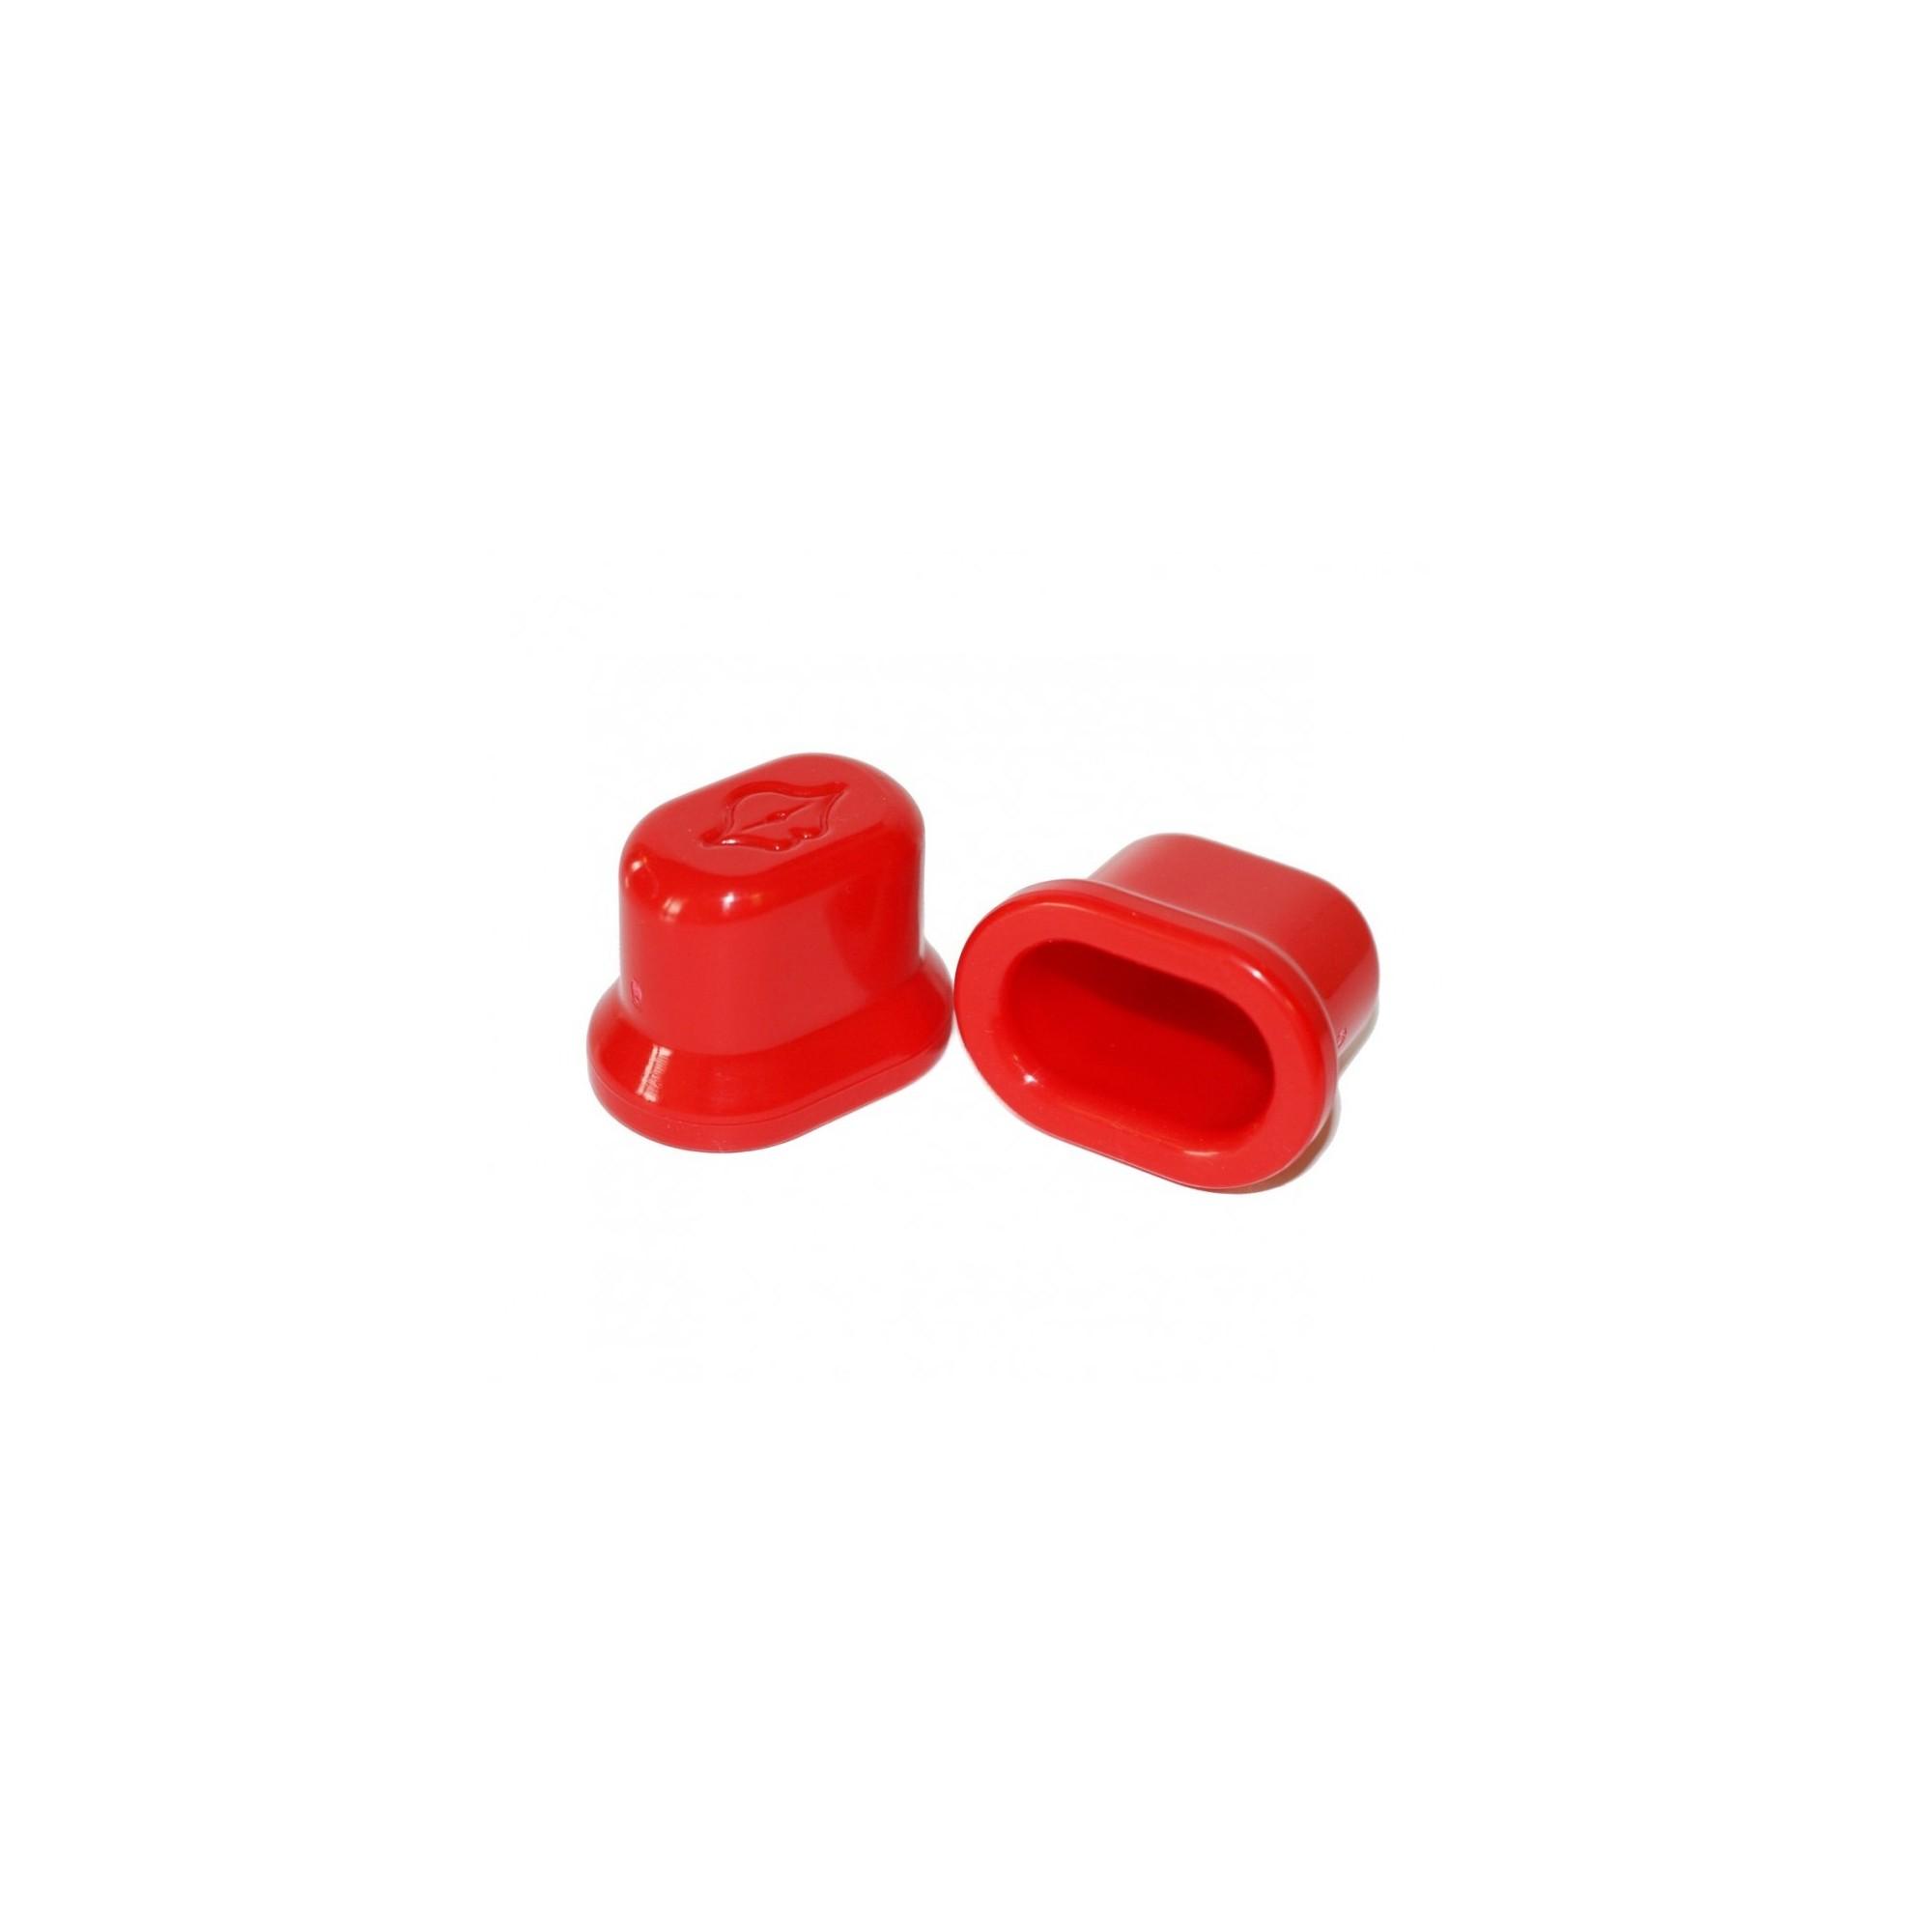 Fullips Lip Enhancer Medium Oval